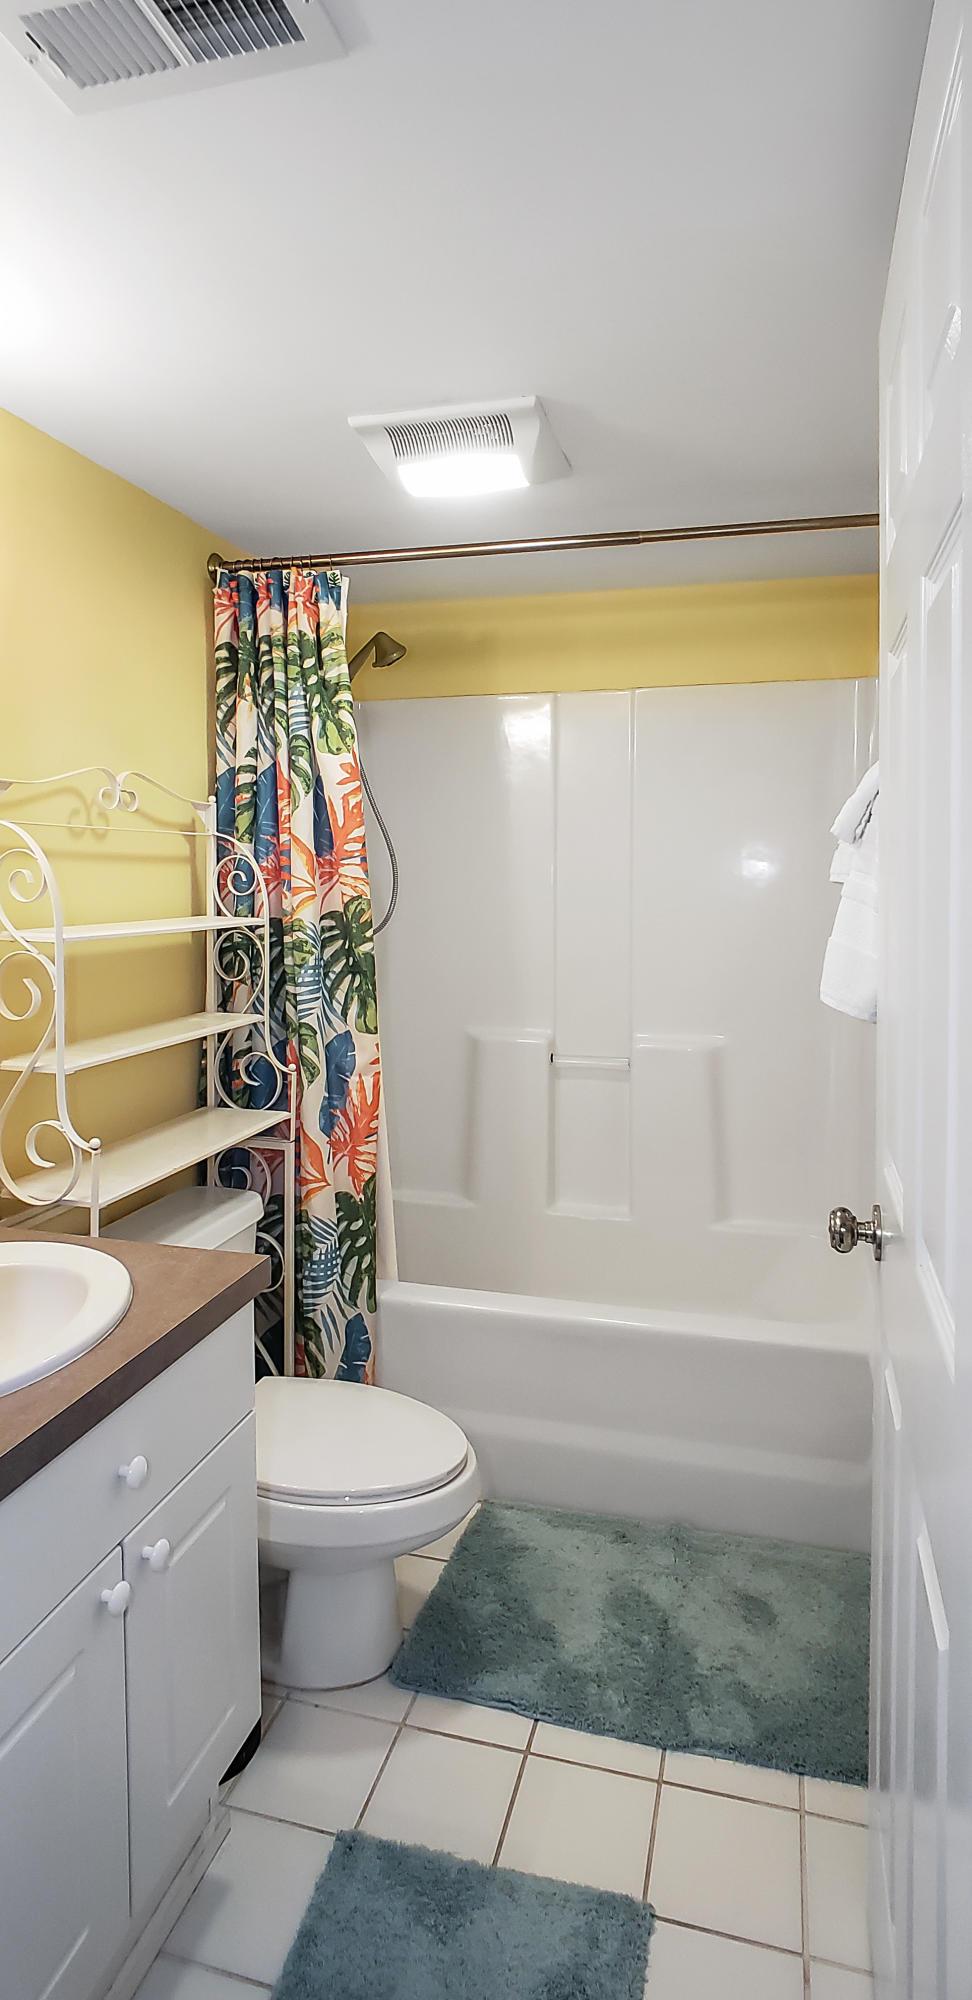 Turn of River Homes For Sale - 2395 Folly Rd, Folly Beach, SC - 8